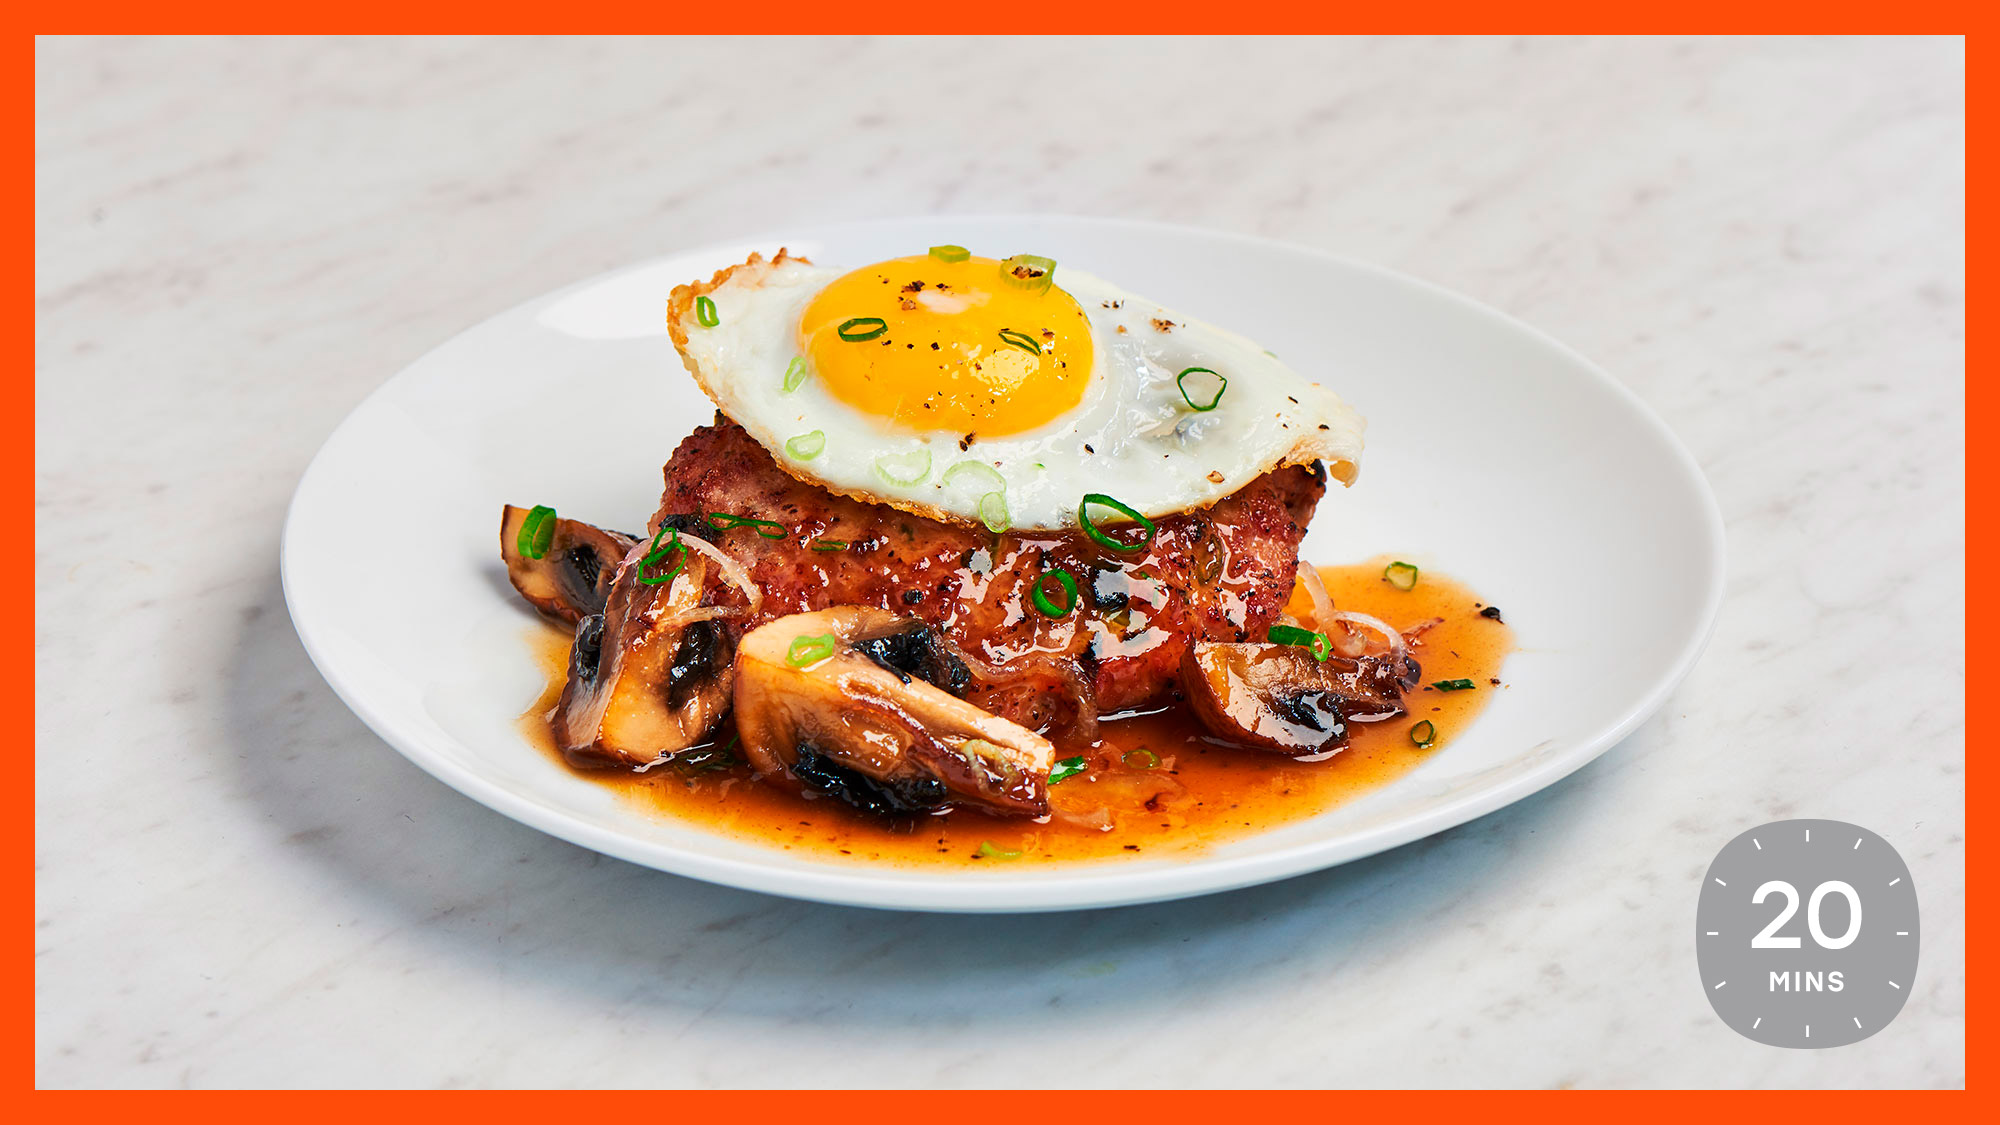 Pork-Hash-Loco-Moco-with-Soy-Mustard-Gravy.jpg